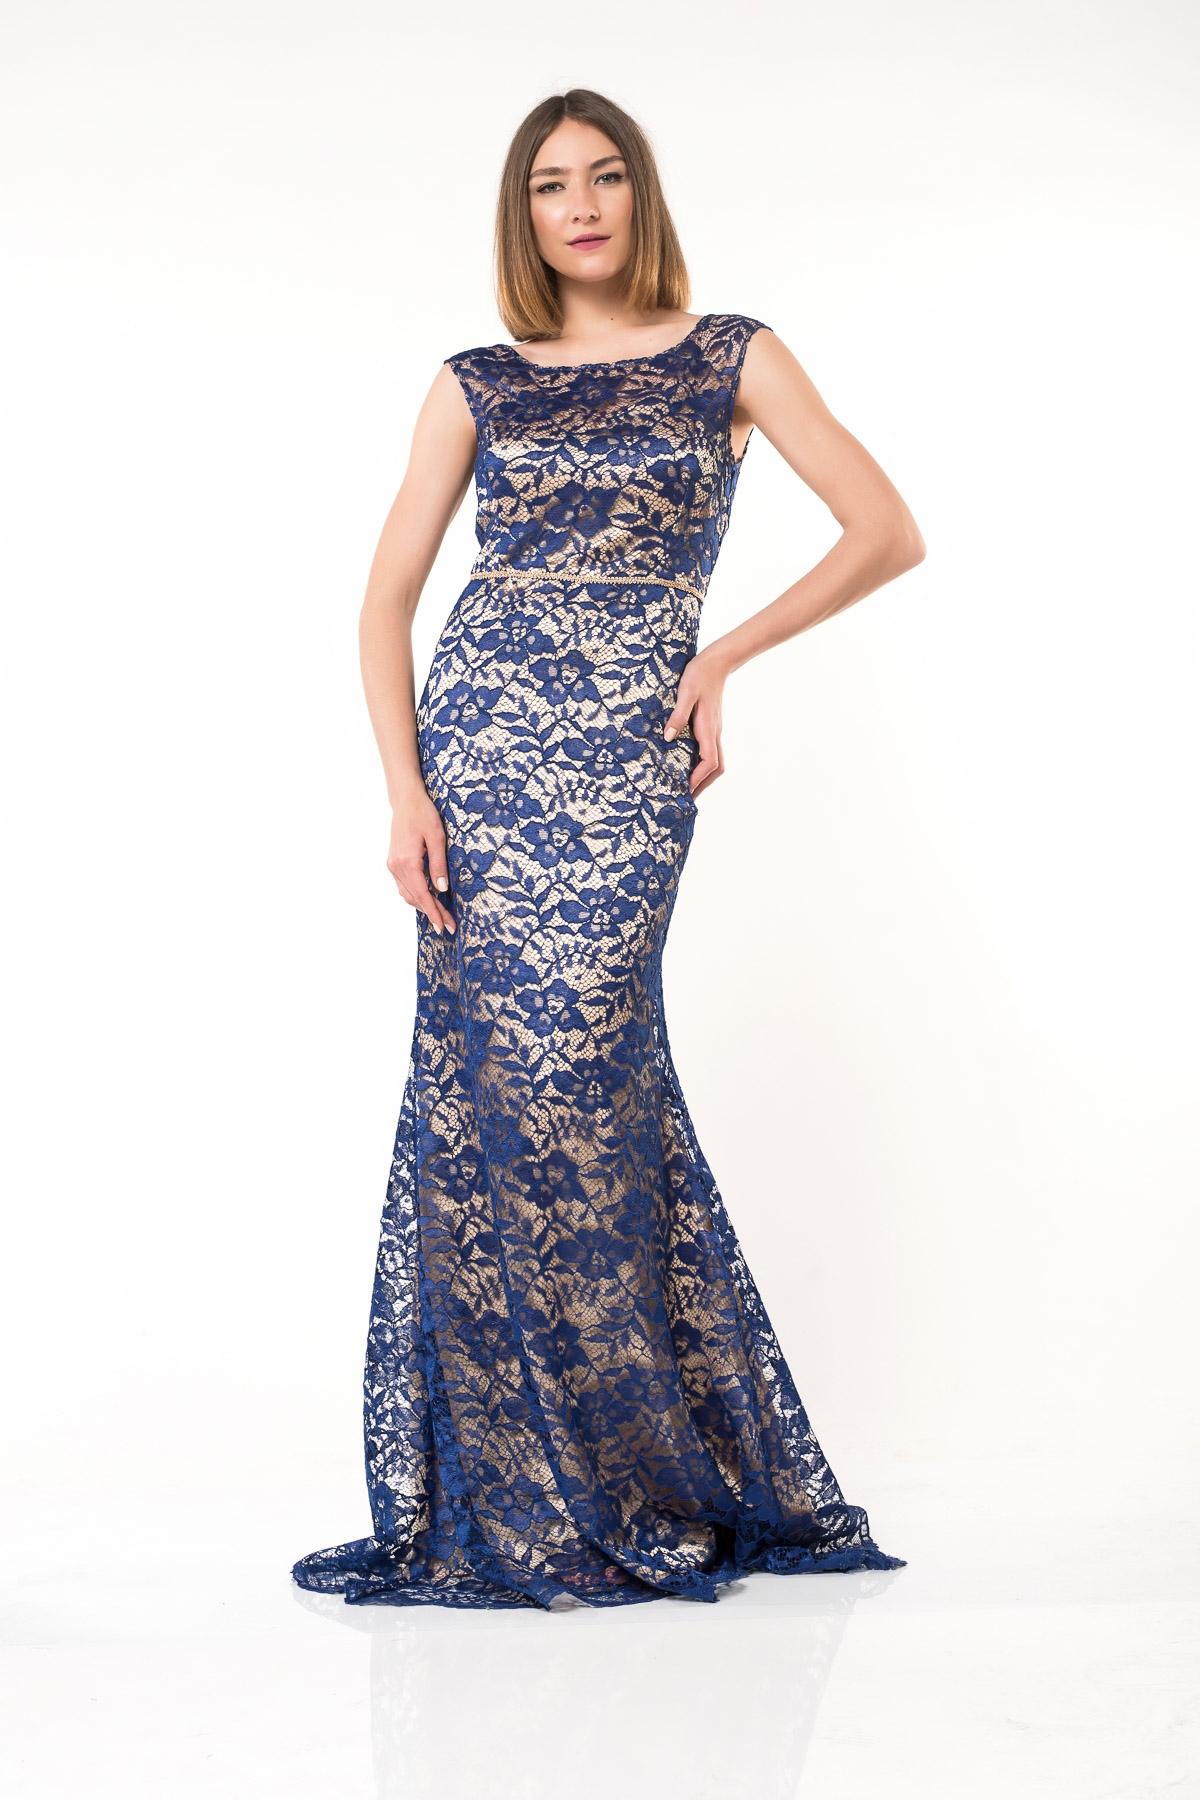 0a3e0c28cb76 Φόρεμα μπεζ με μπλε δαντέλα maxi σε γοργονέ στυλ